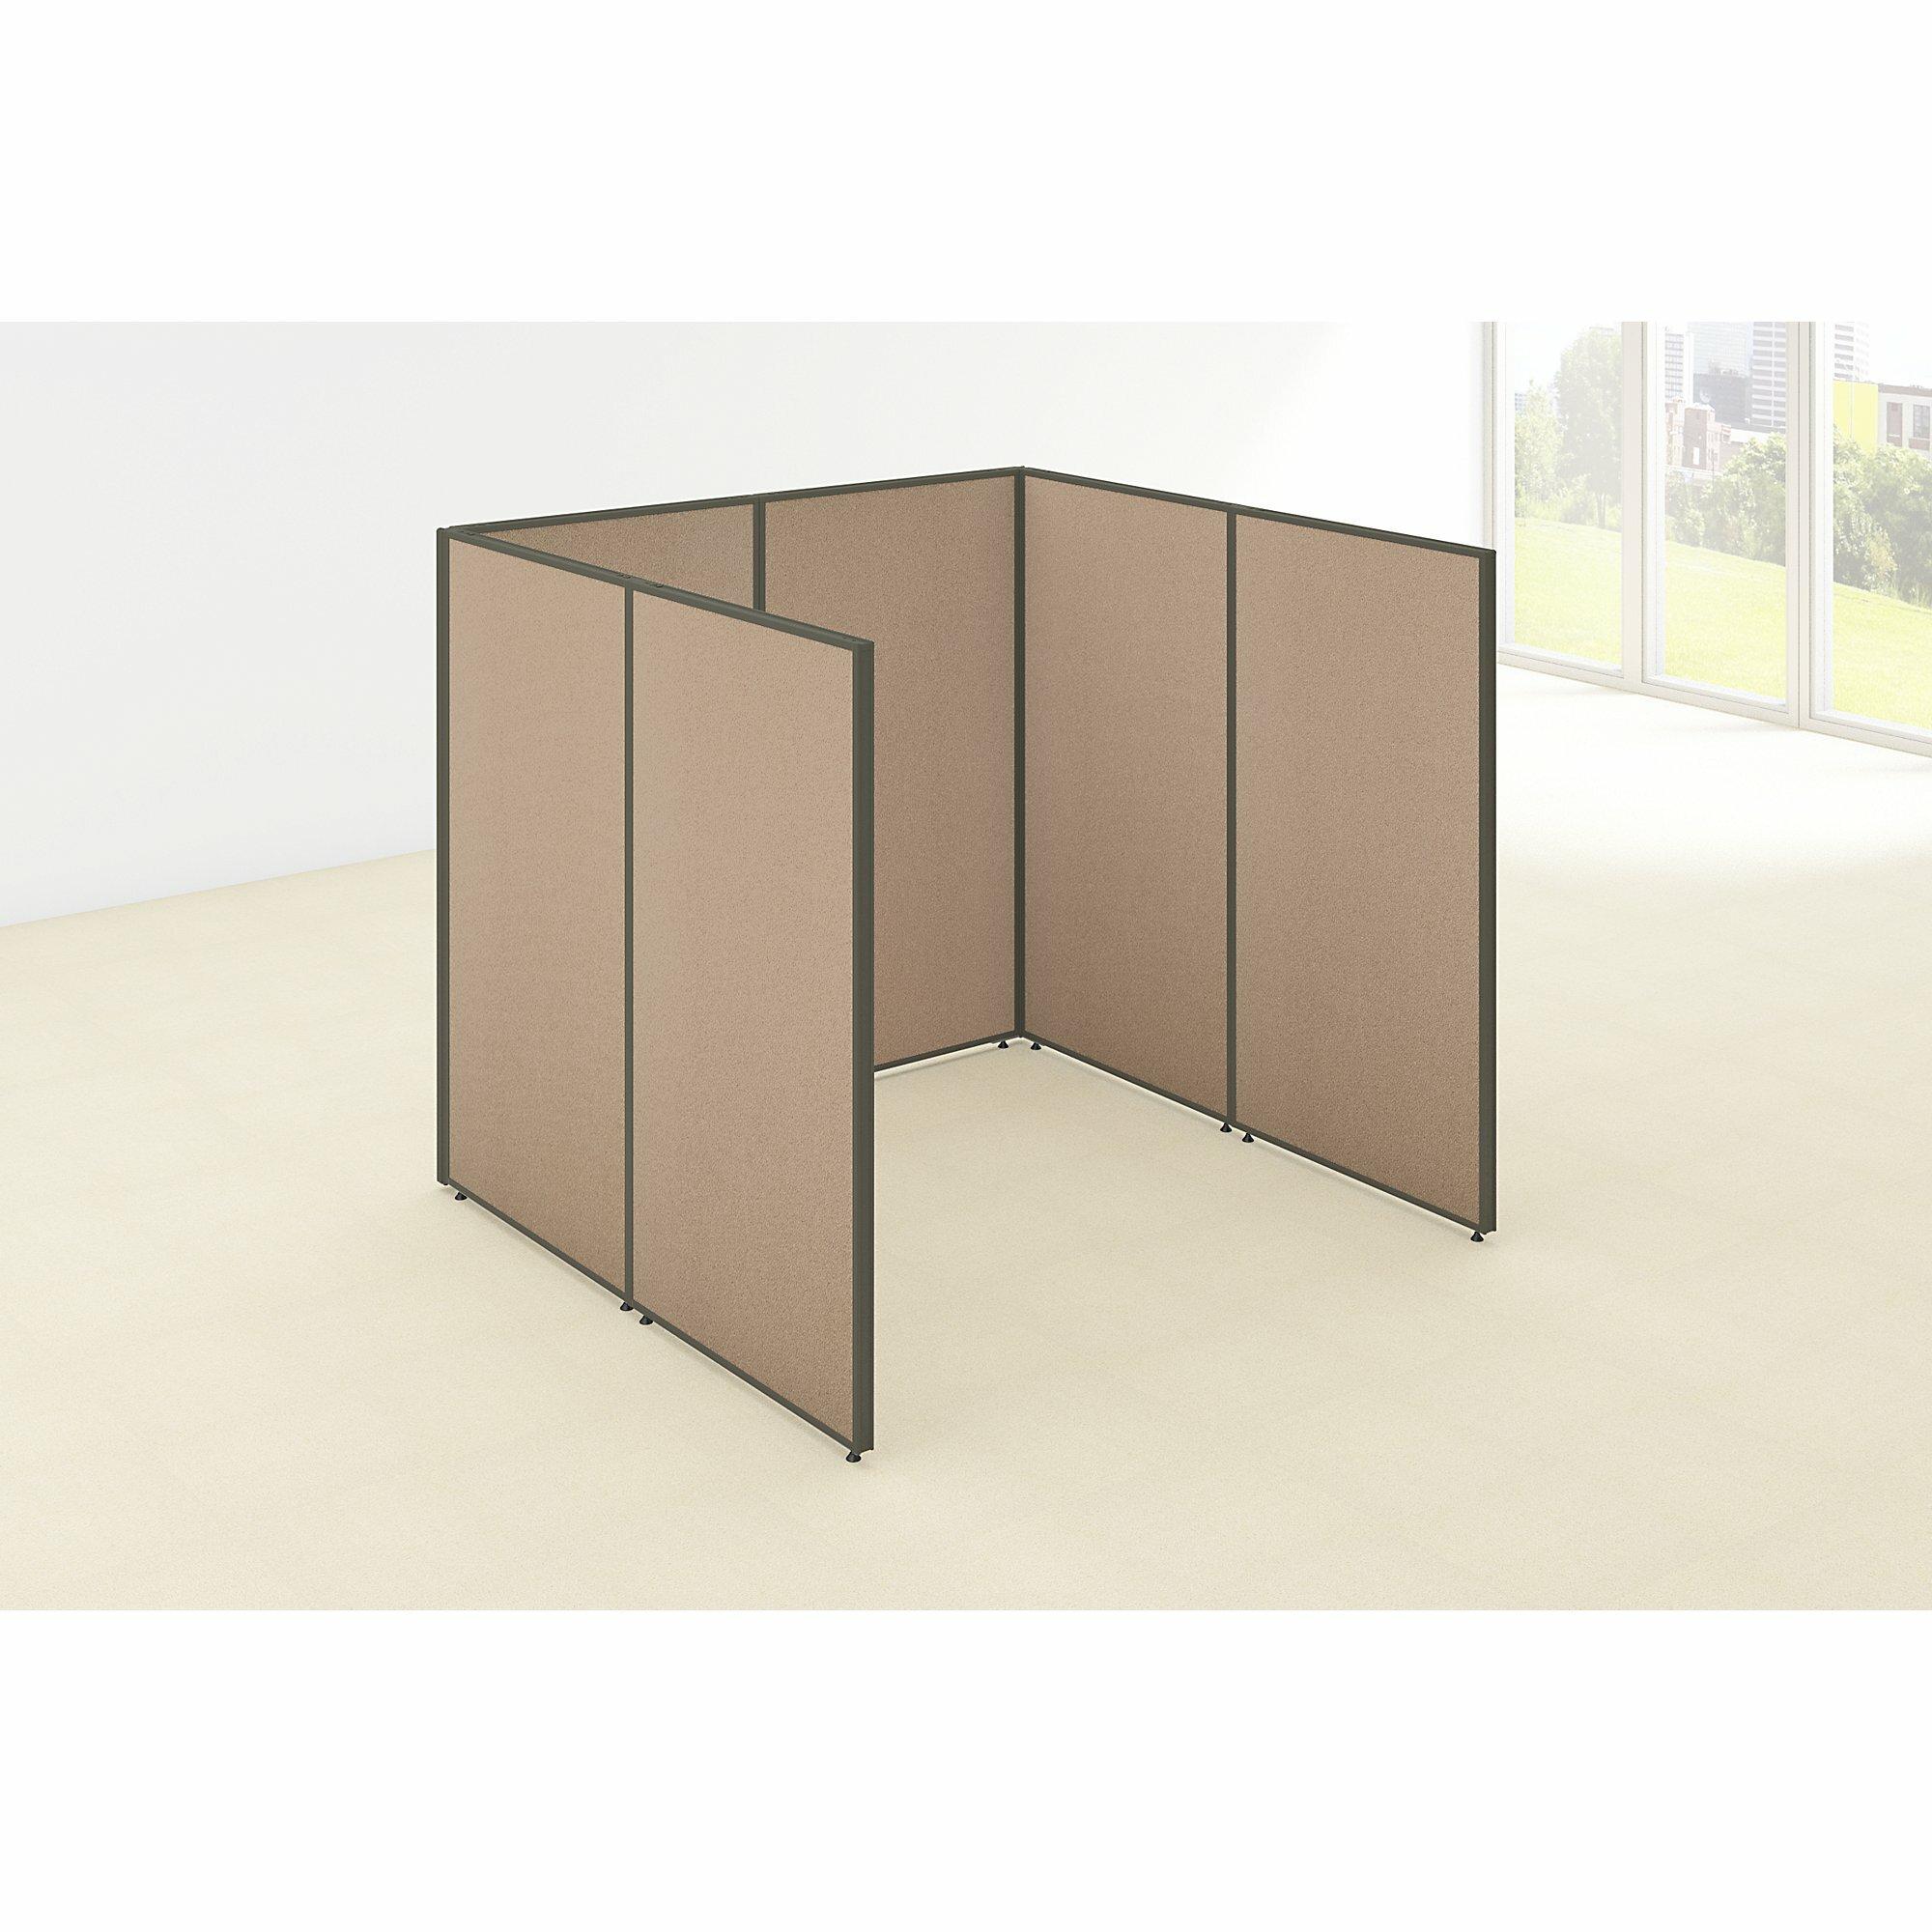 Aspenhome Warm Cherry Executive Modular Home Office: Bush Business Furniture ProPanel Open Cubicle